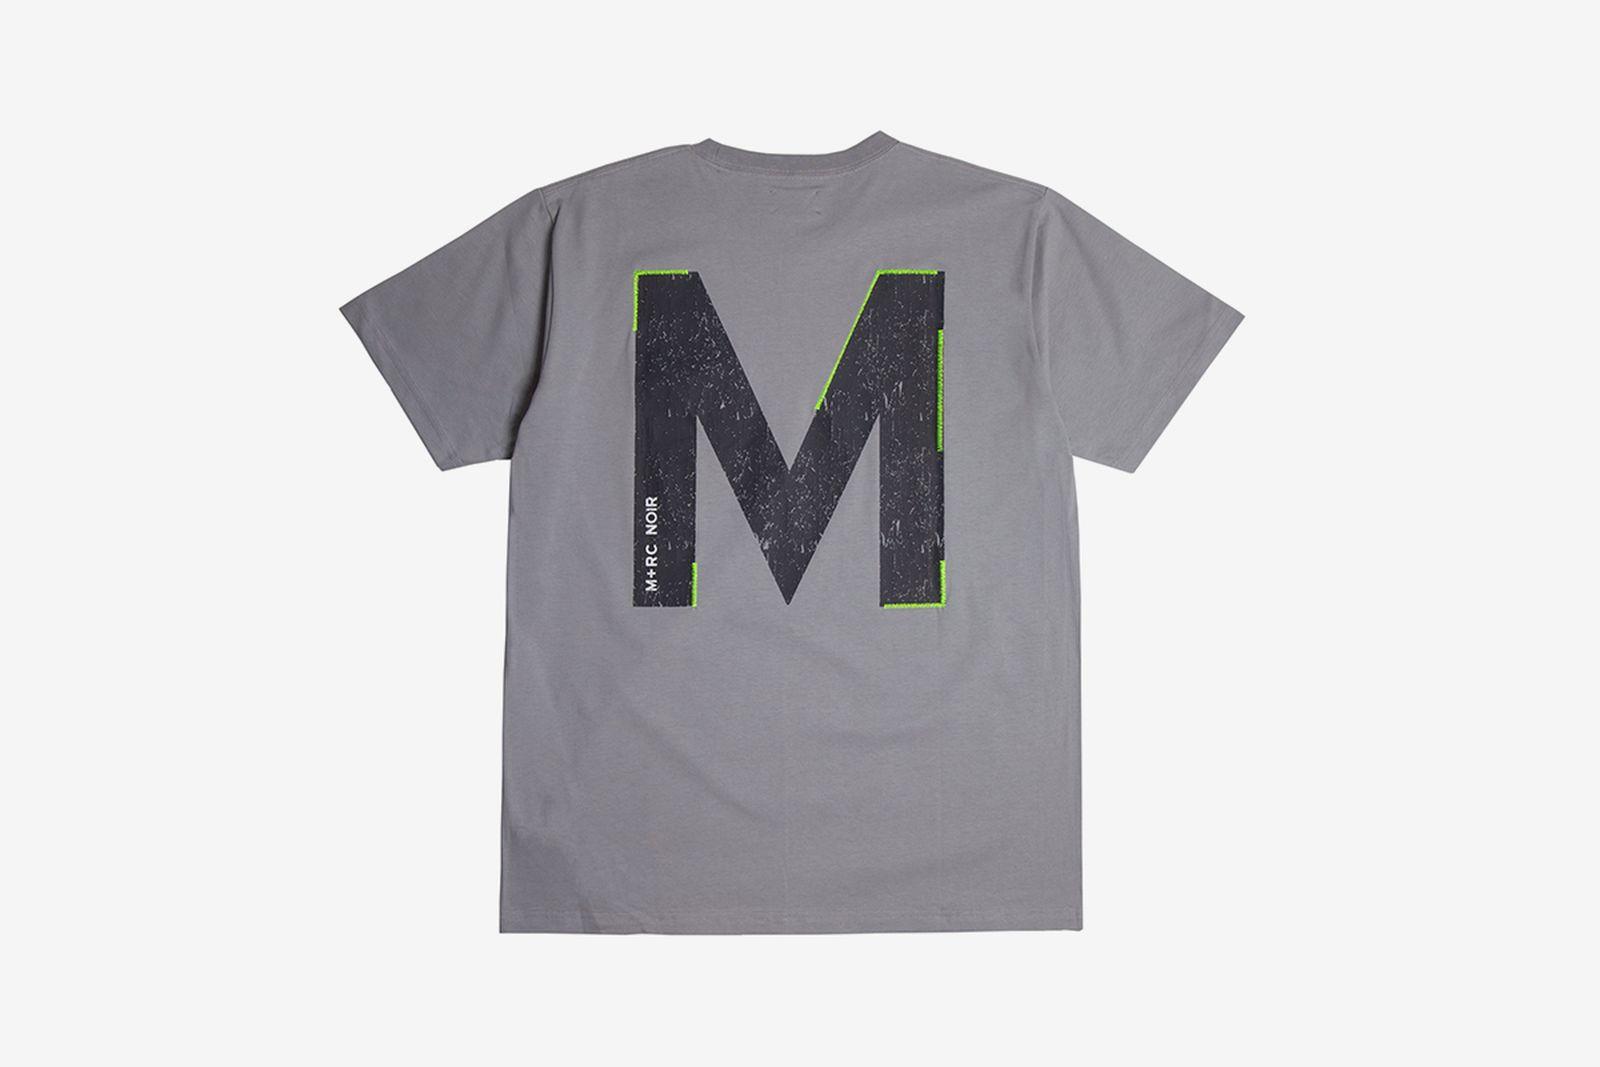 tee shirt big m grey back M RC 2048x2048 M+RC NOIR SS18 playboi carti